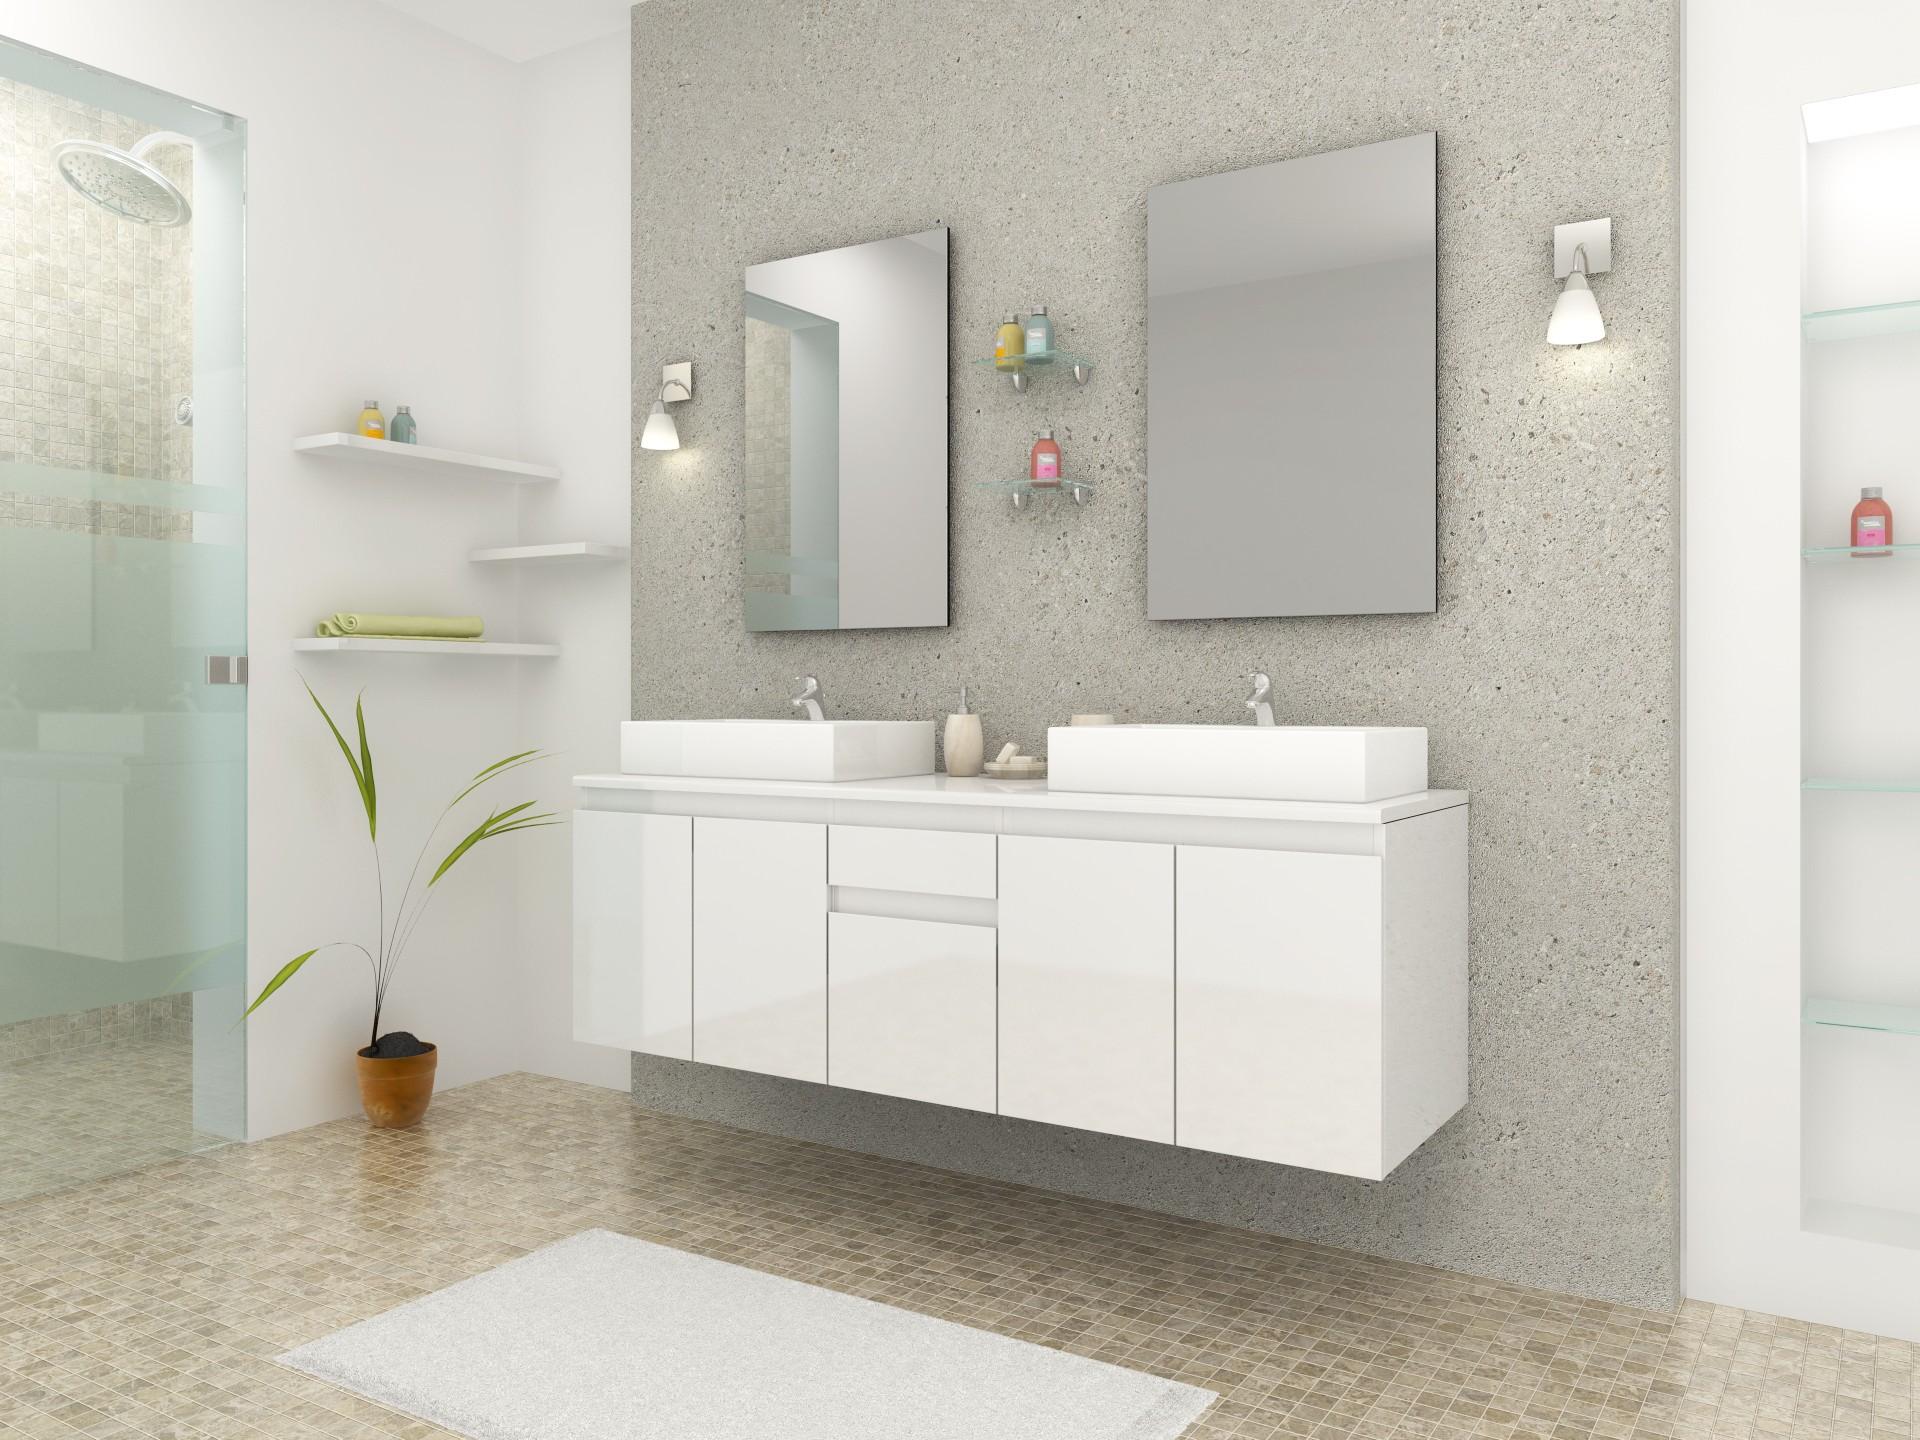 Ensemble Complet Meuble Salle Bain 2 Vasques Blanc Laque Miroirs